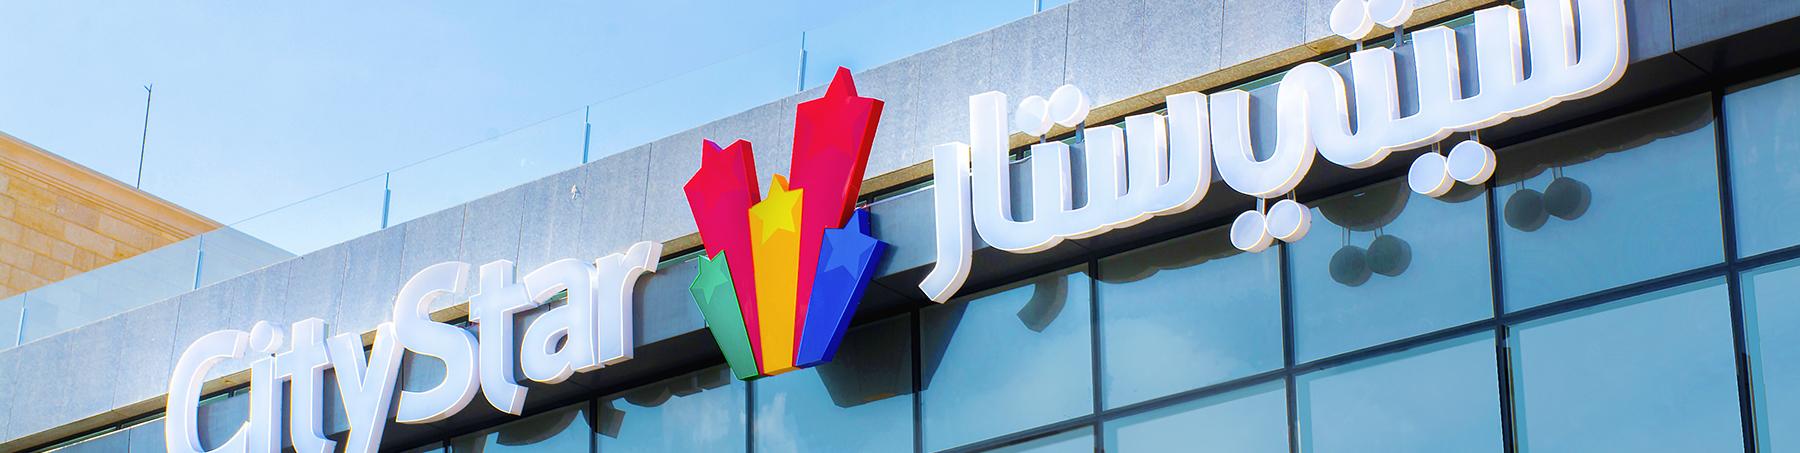 city star mega store building logo